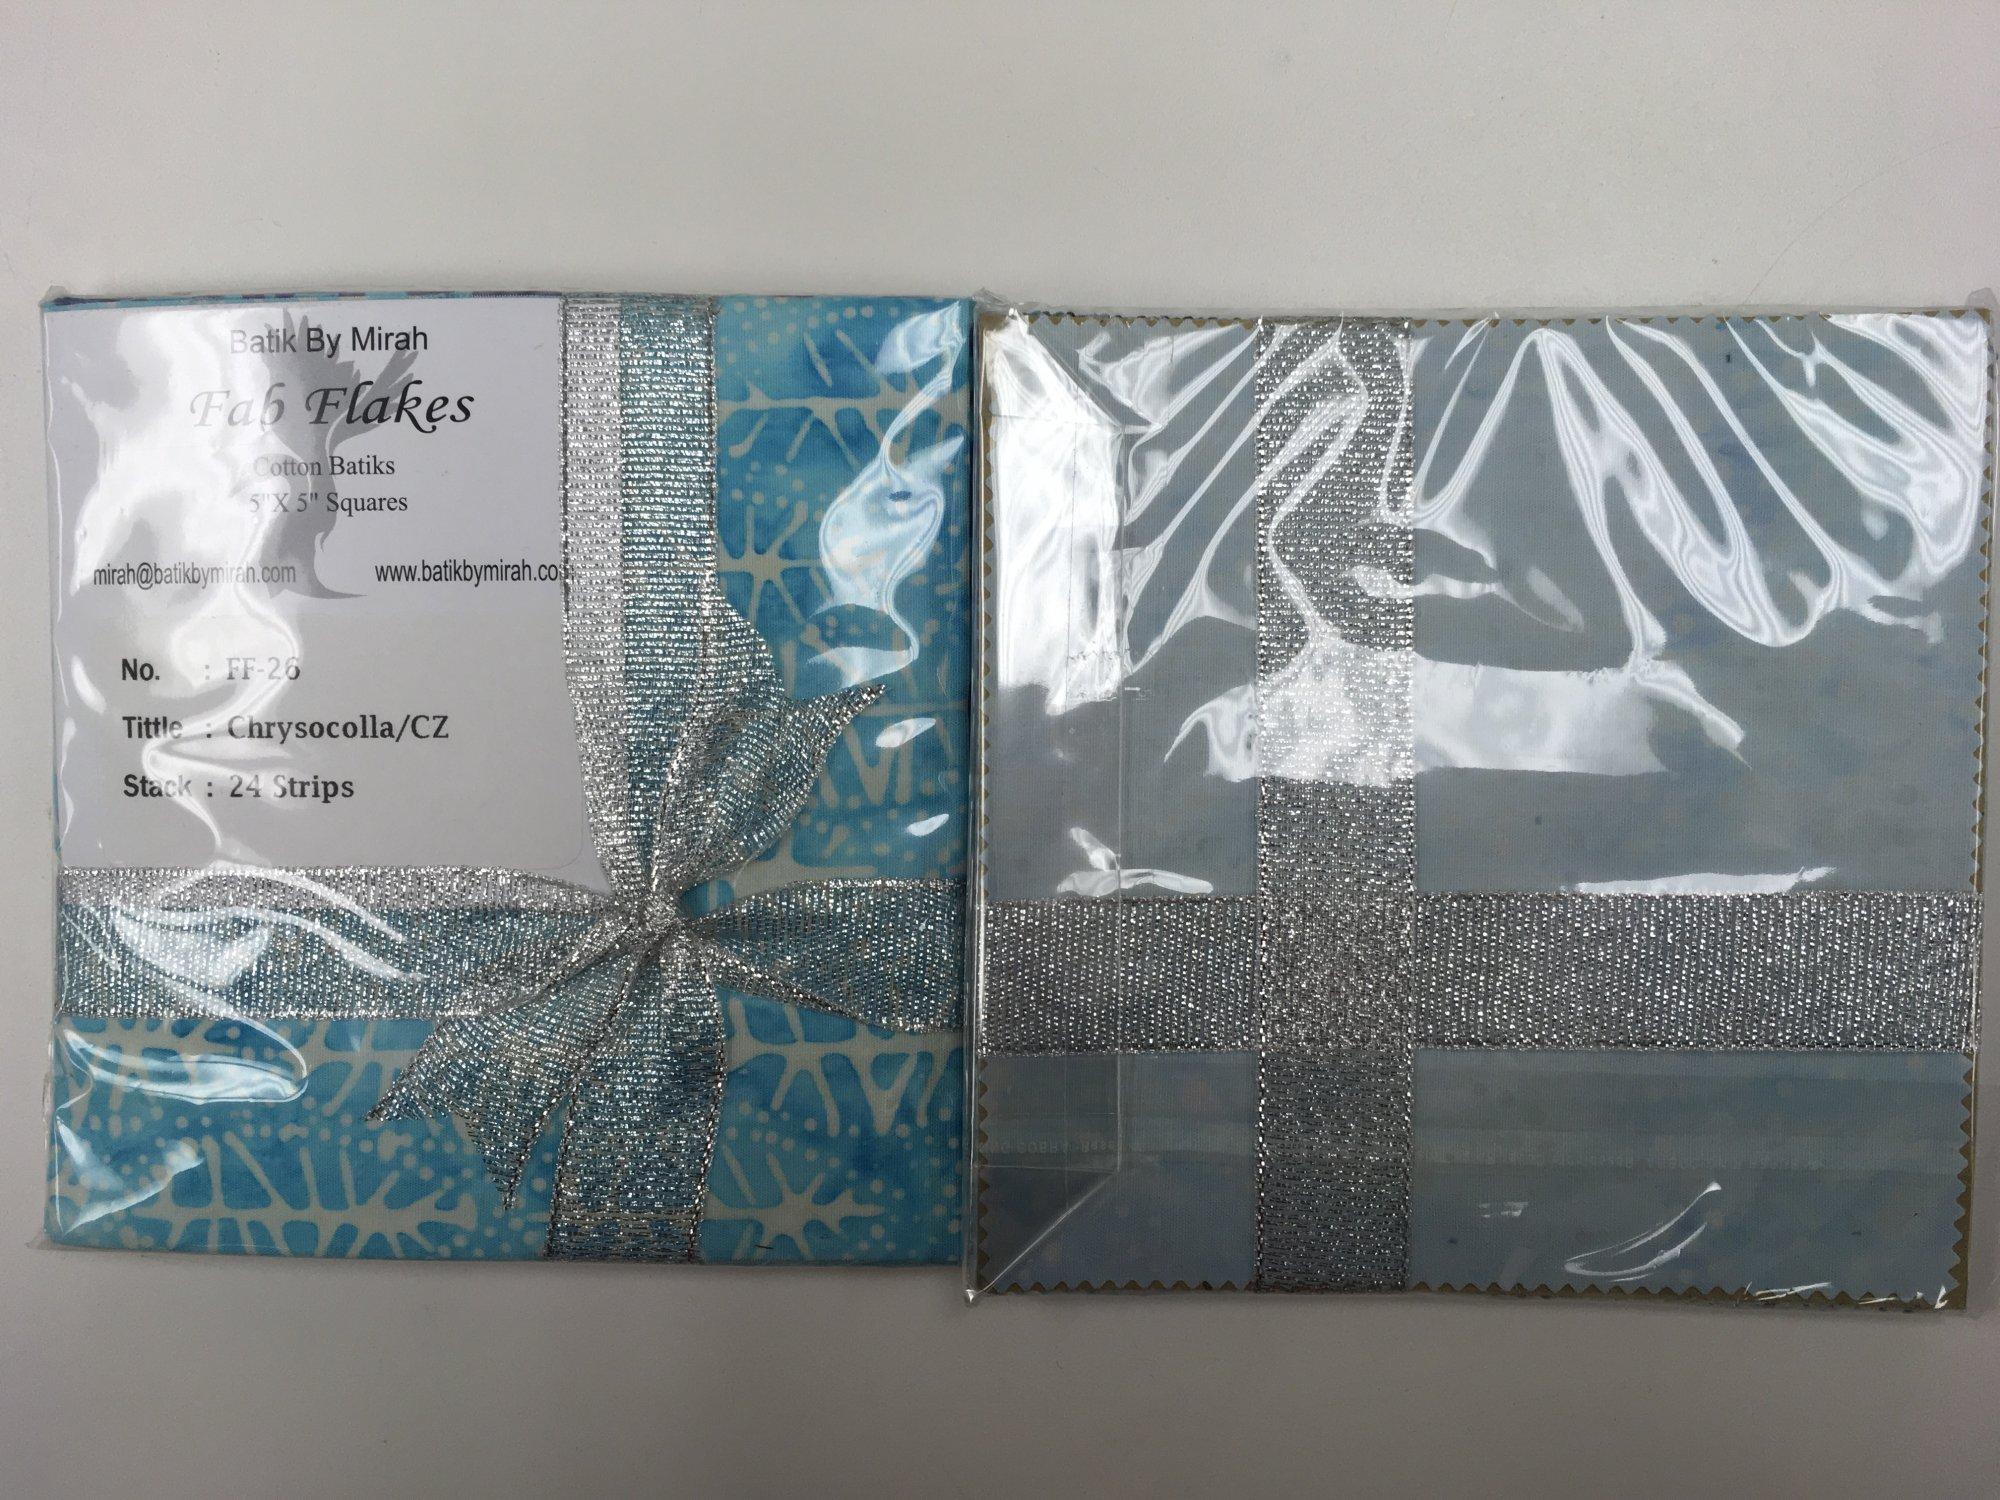 BATIK CHRYSOCOLLA FAB FLAKES 5 in Squares 24/pack FF26 Batik by Mirah - copy